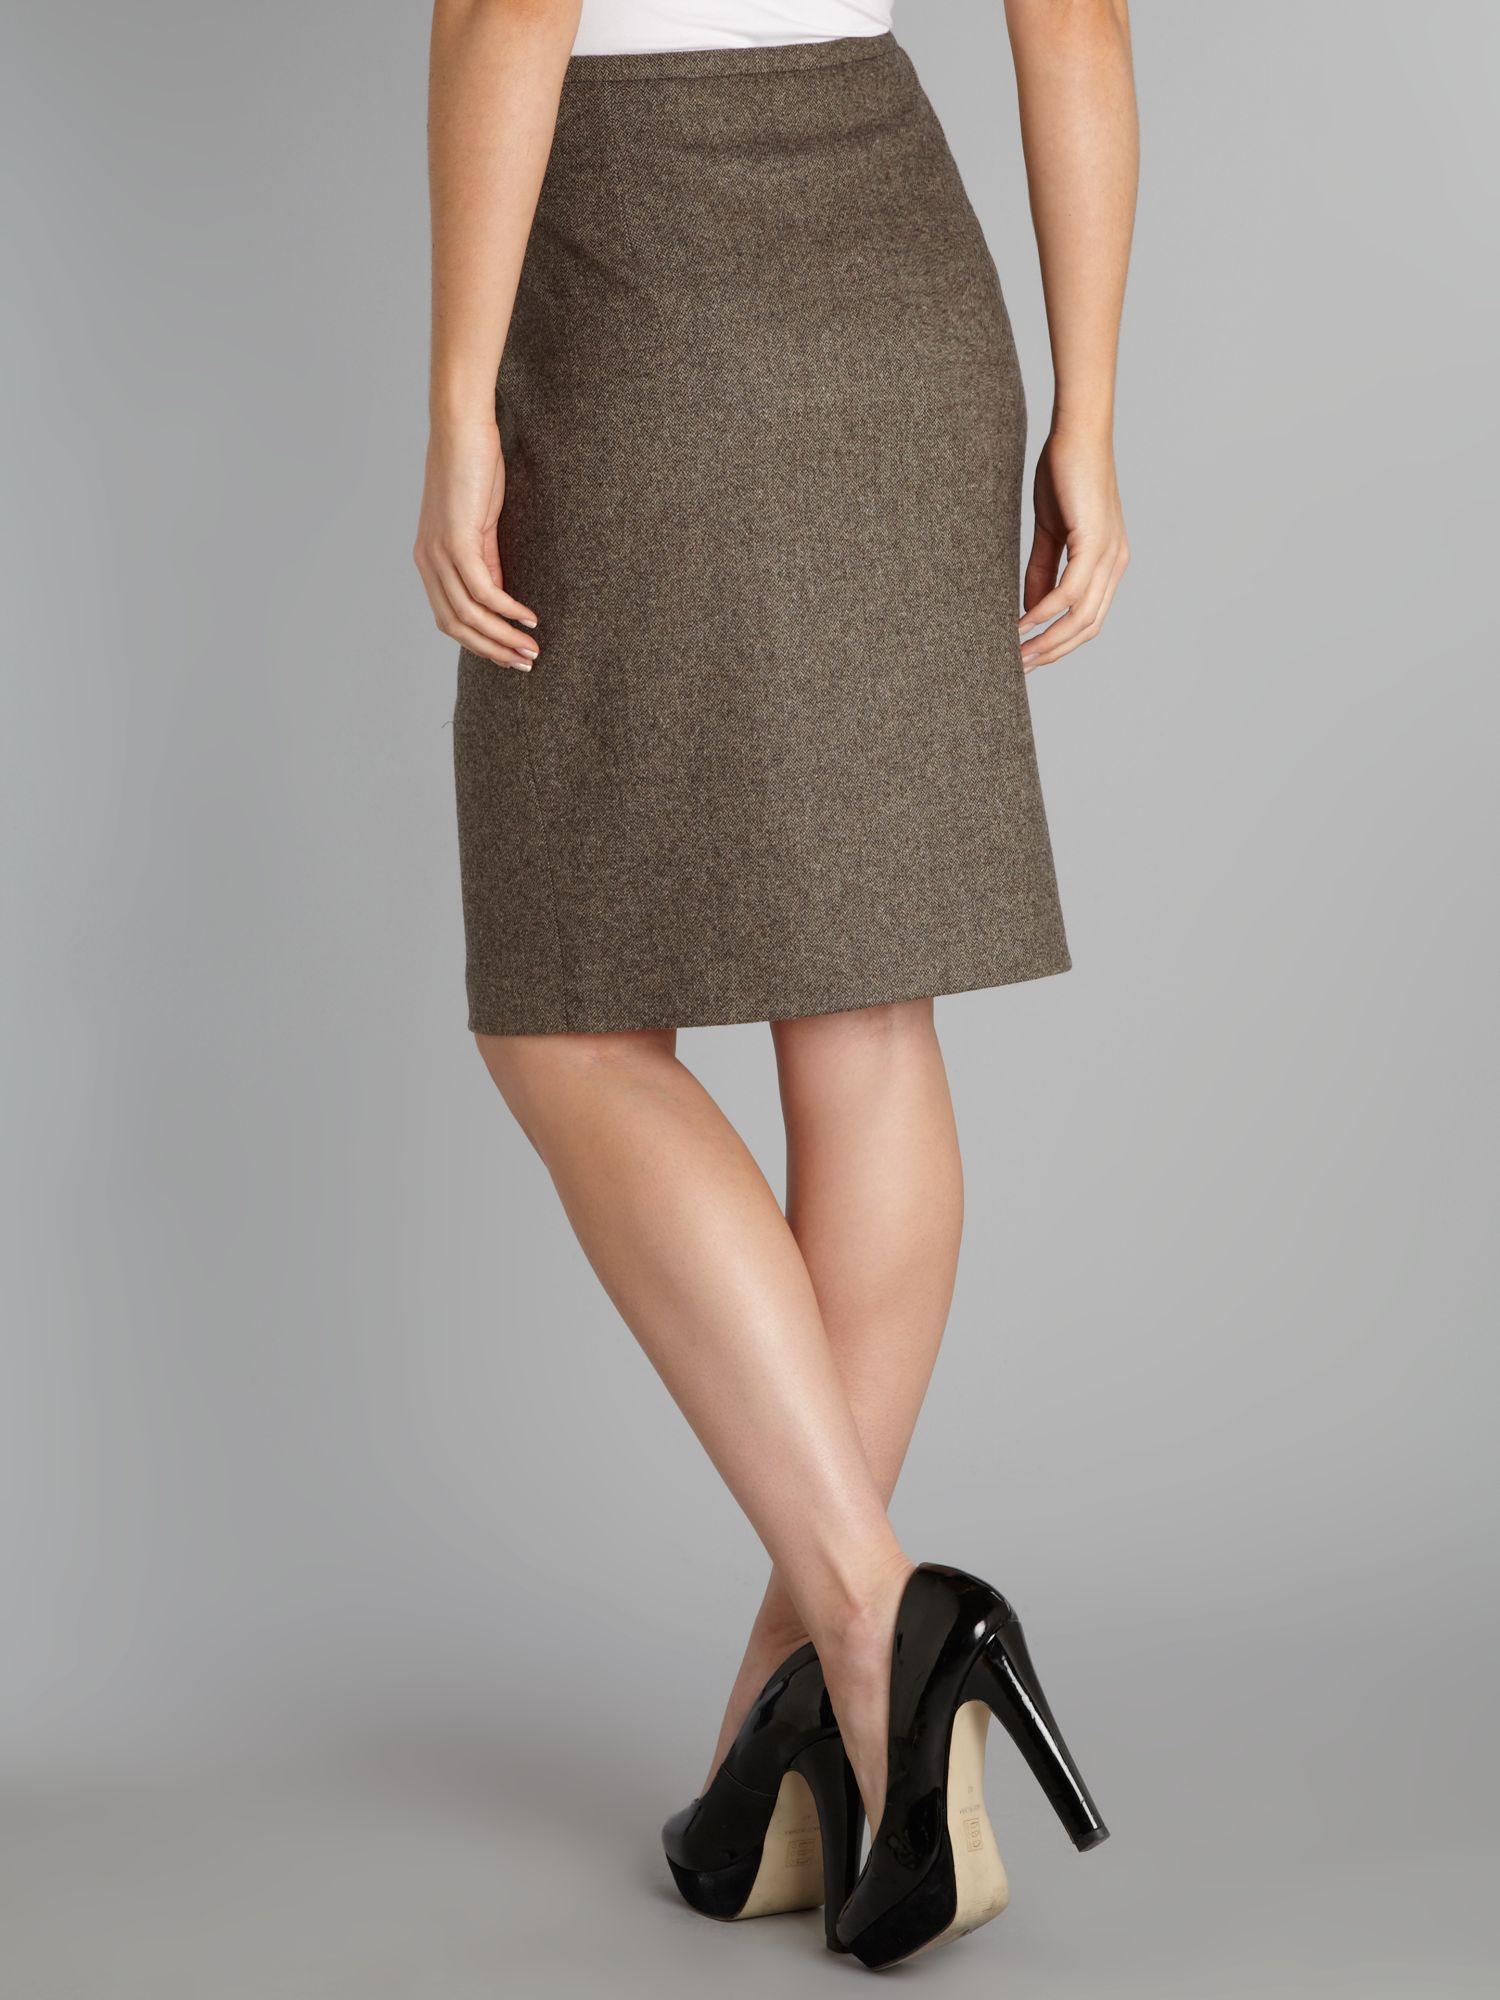 Dark Brown Pencil Skirt